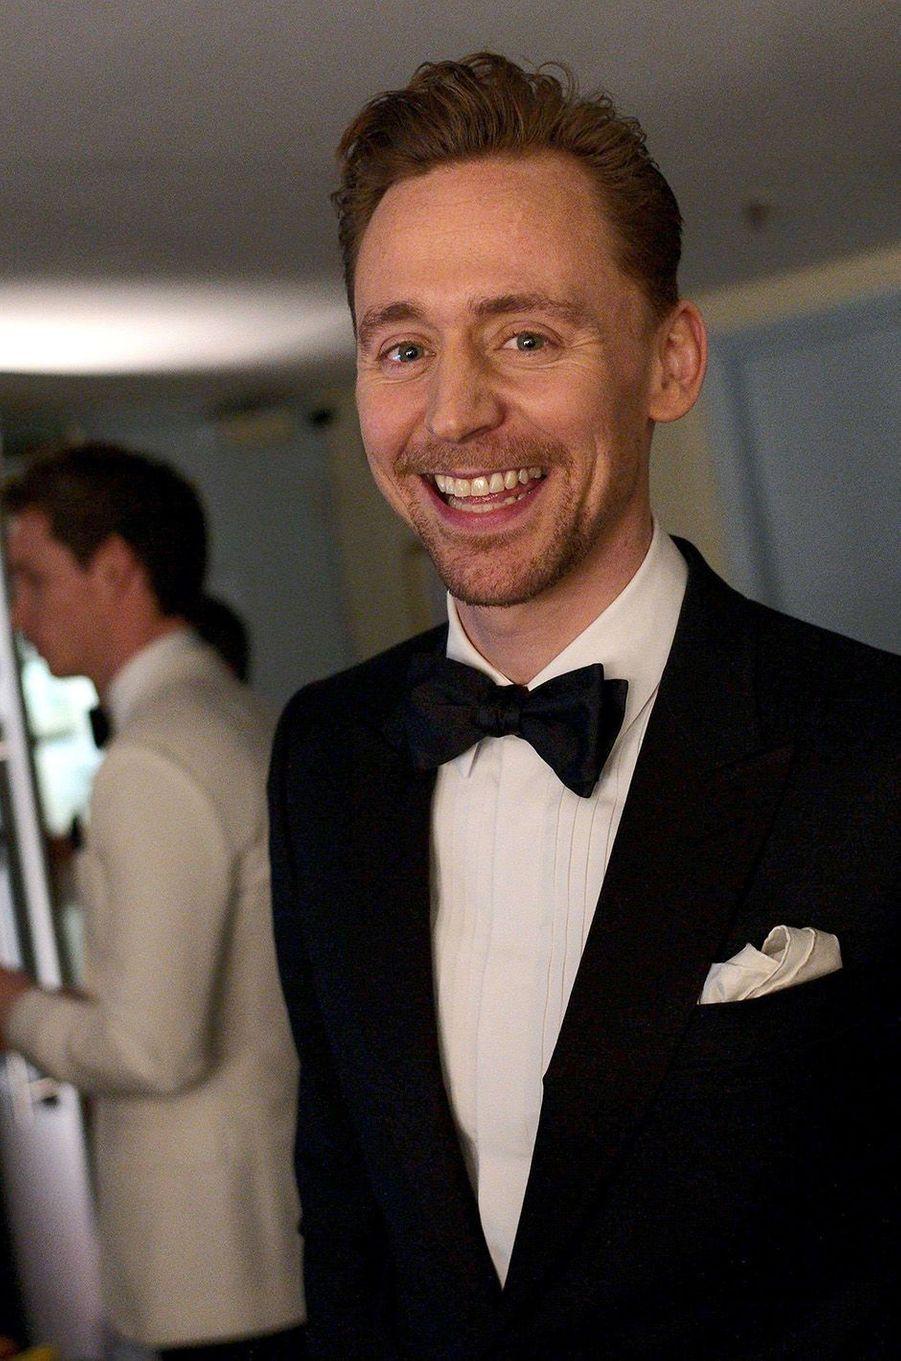 Tom Hiddleston dans les coulisses des BAFTA 2017.